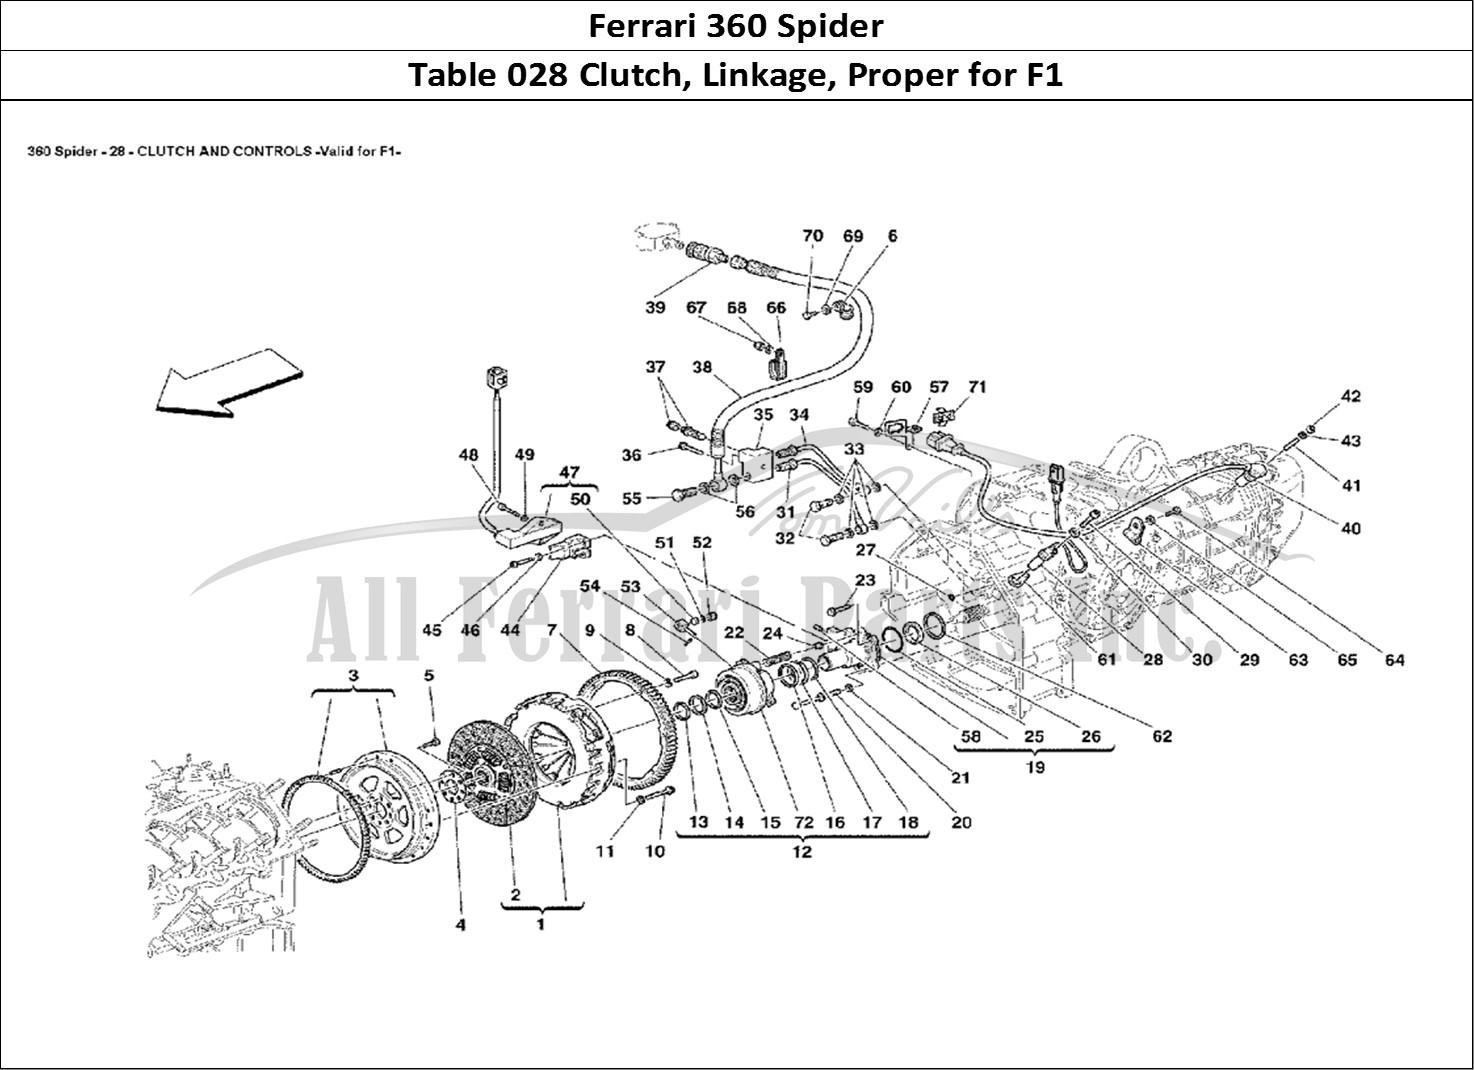 Buy Original Ferrari 360 Spider 028 Clutch Linkage Proper For F1 Ferrari Parts Spares